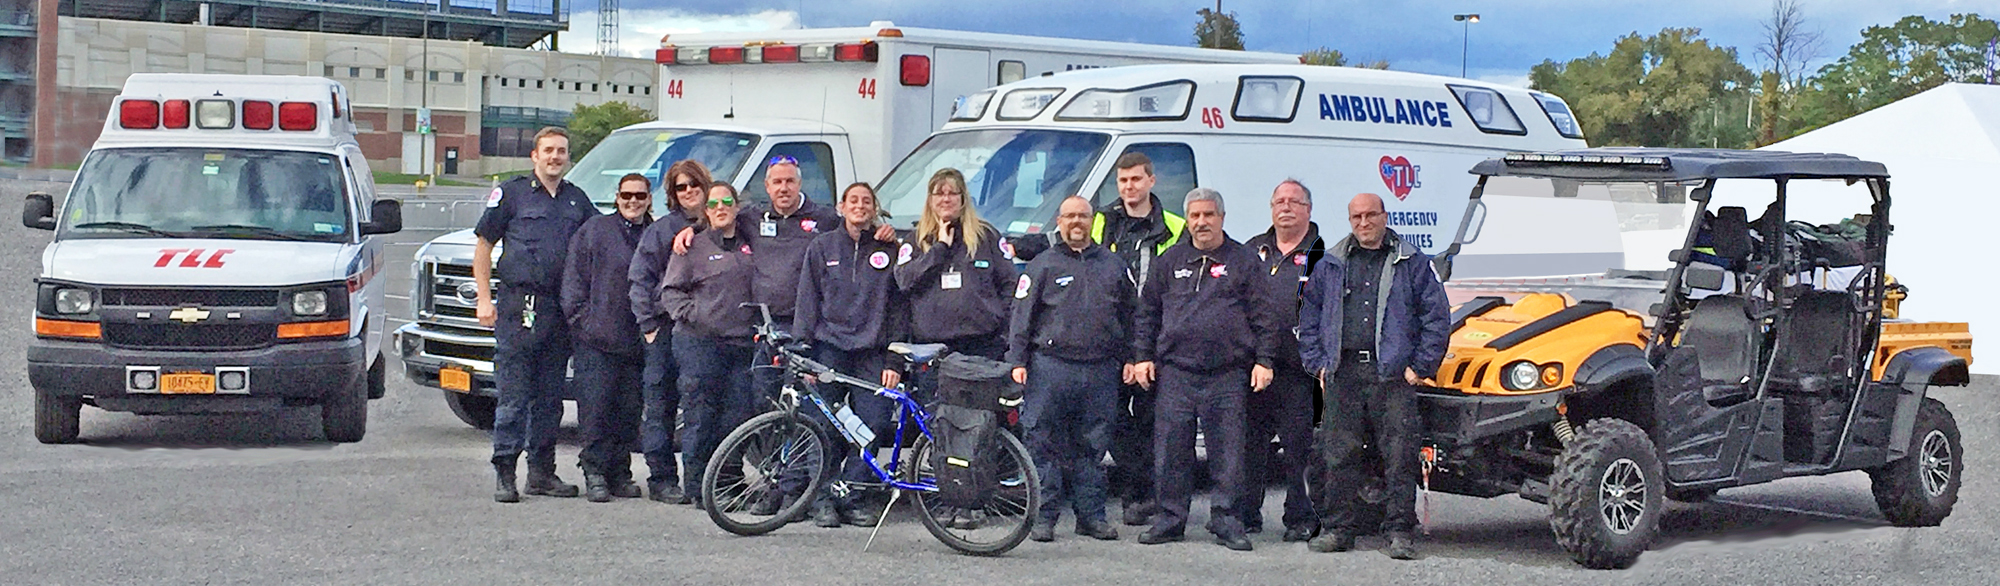 TLC Emergency Medical Services